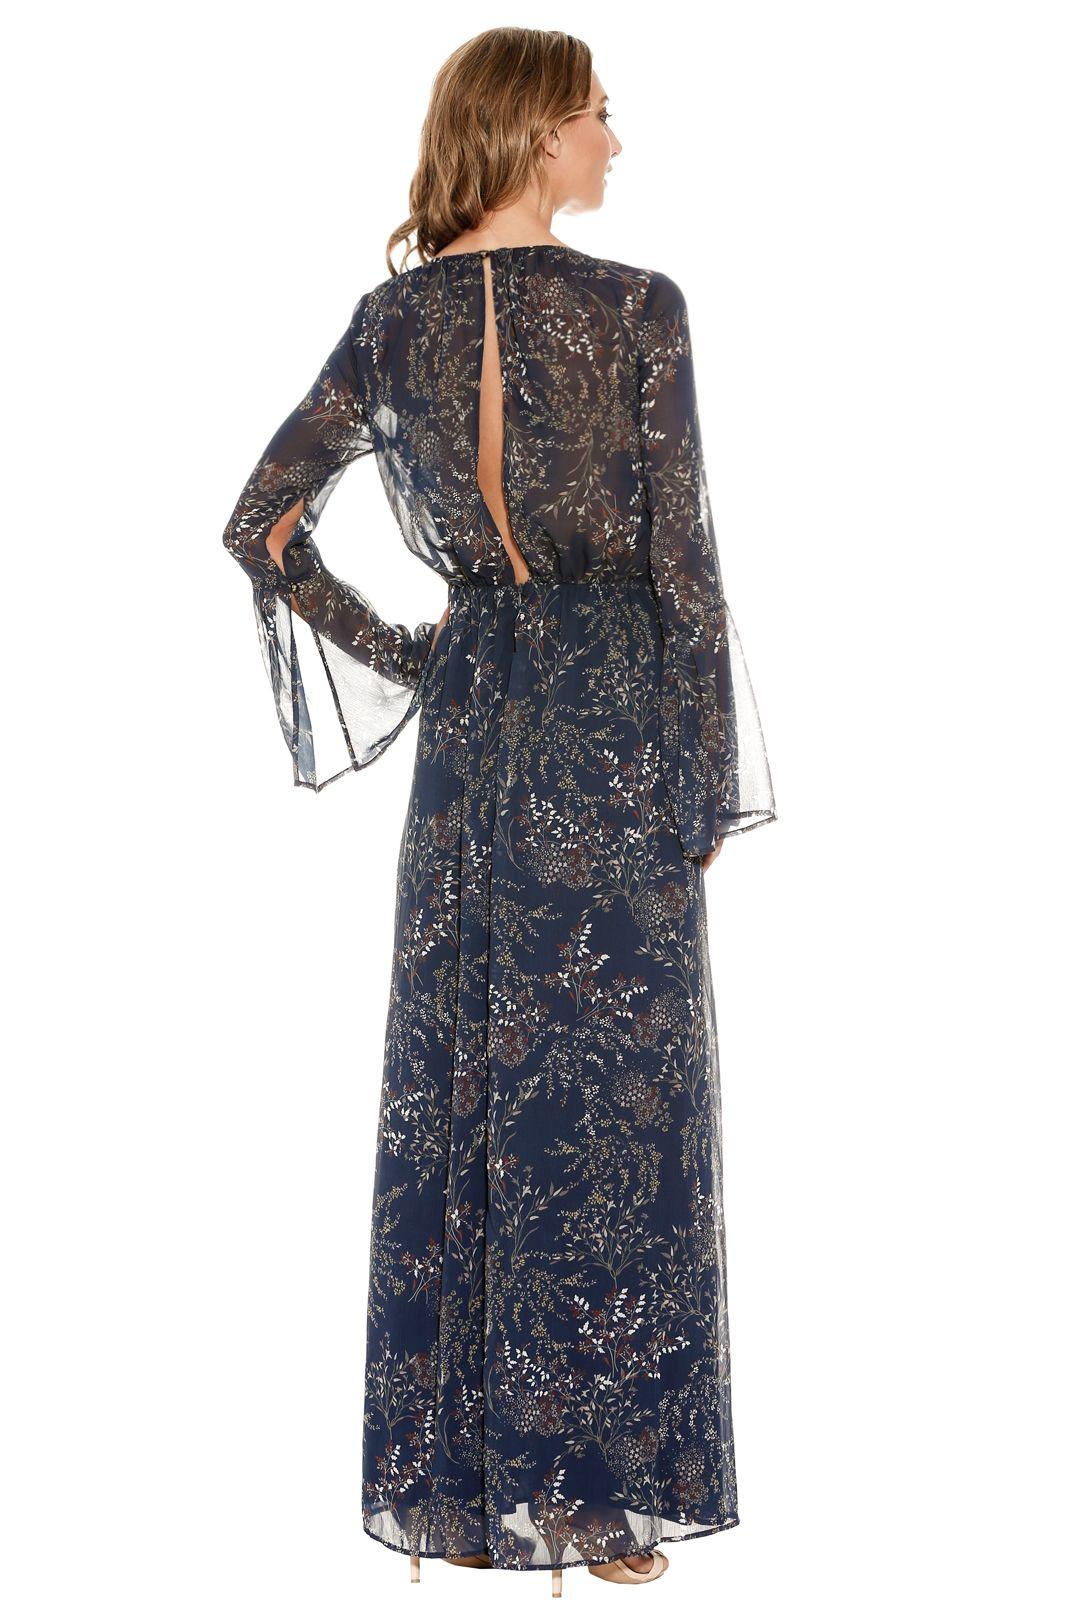 The Jetset Diaries - Mediterranean Maxi Dress - Blue - Back